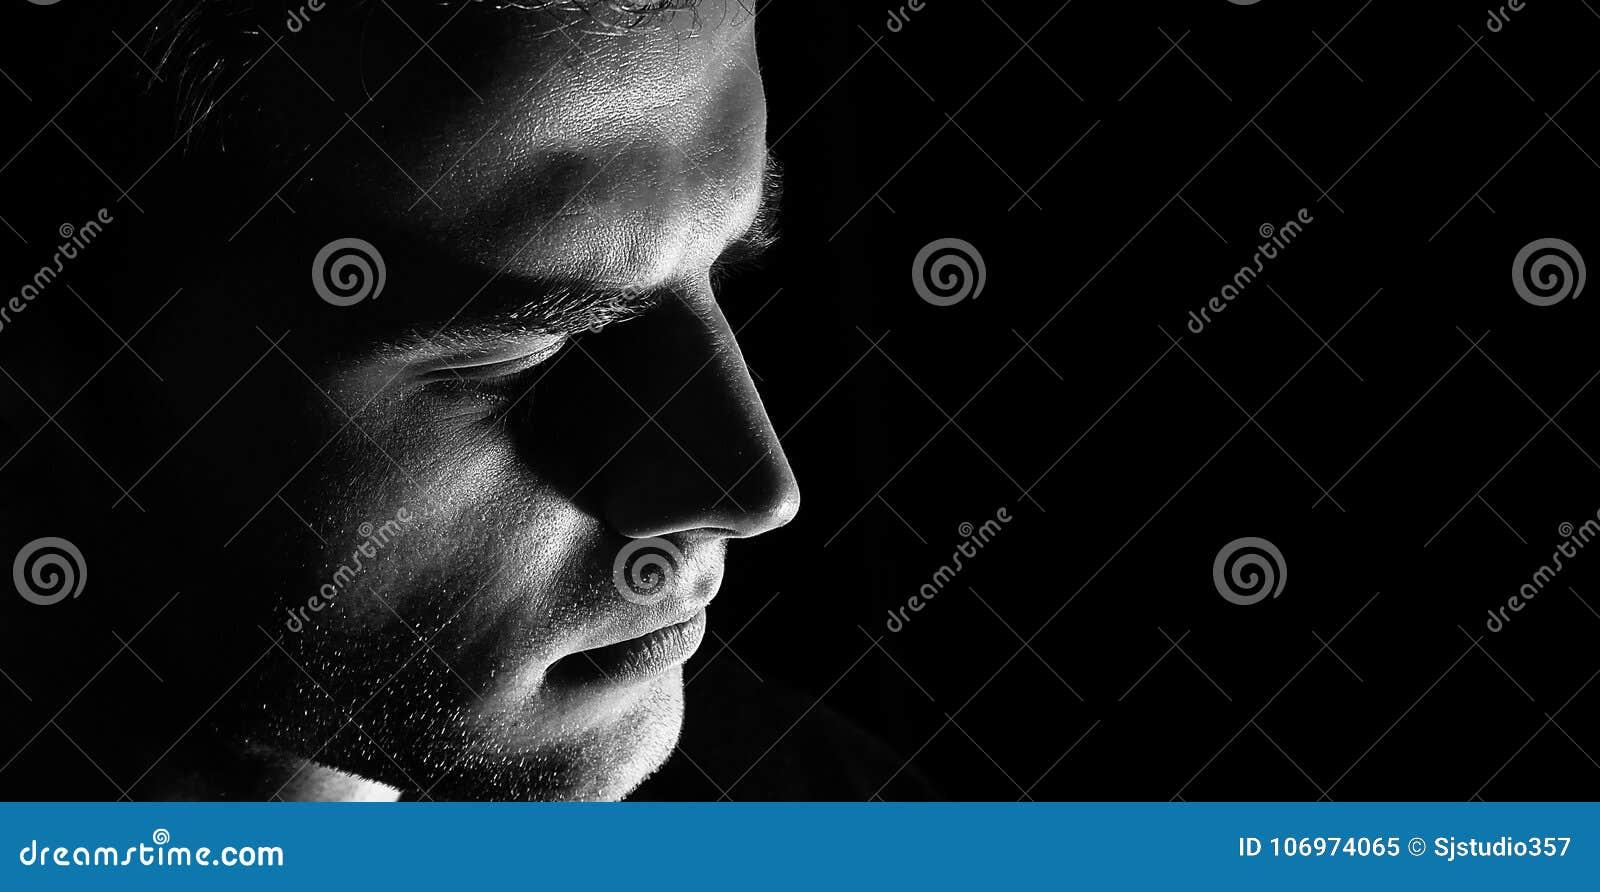 Droevig mensenprofiel, Donker kerelmannetje in depressie, zwart-witte, ernstige blik